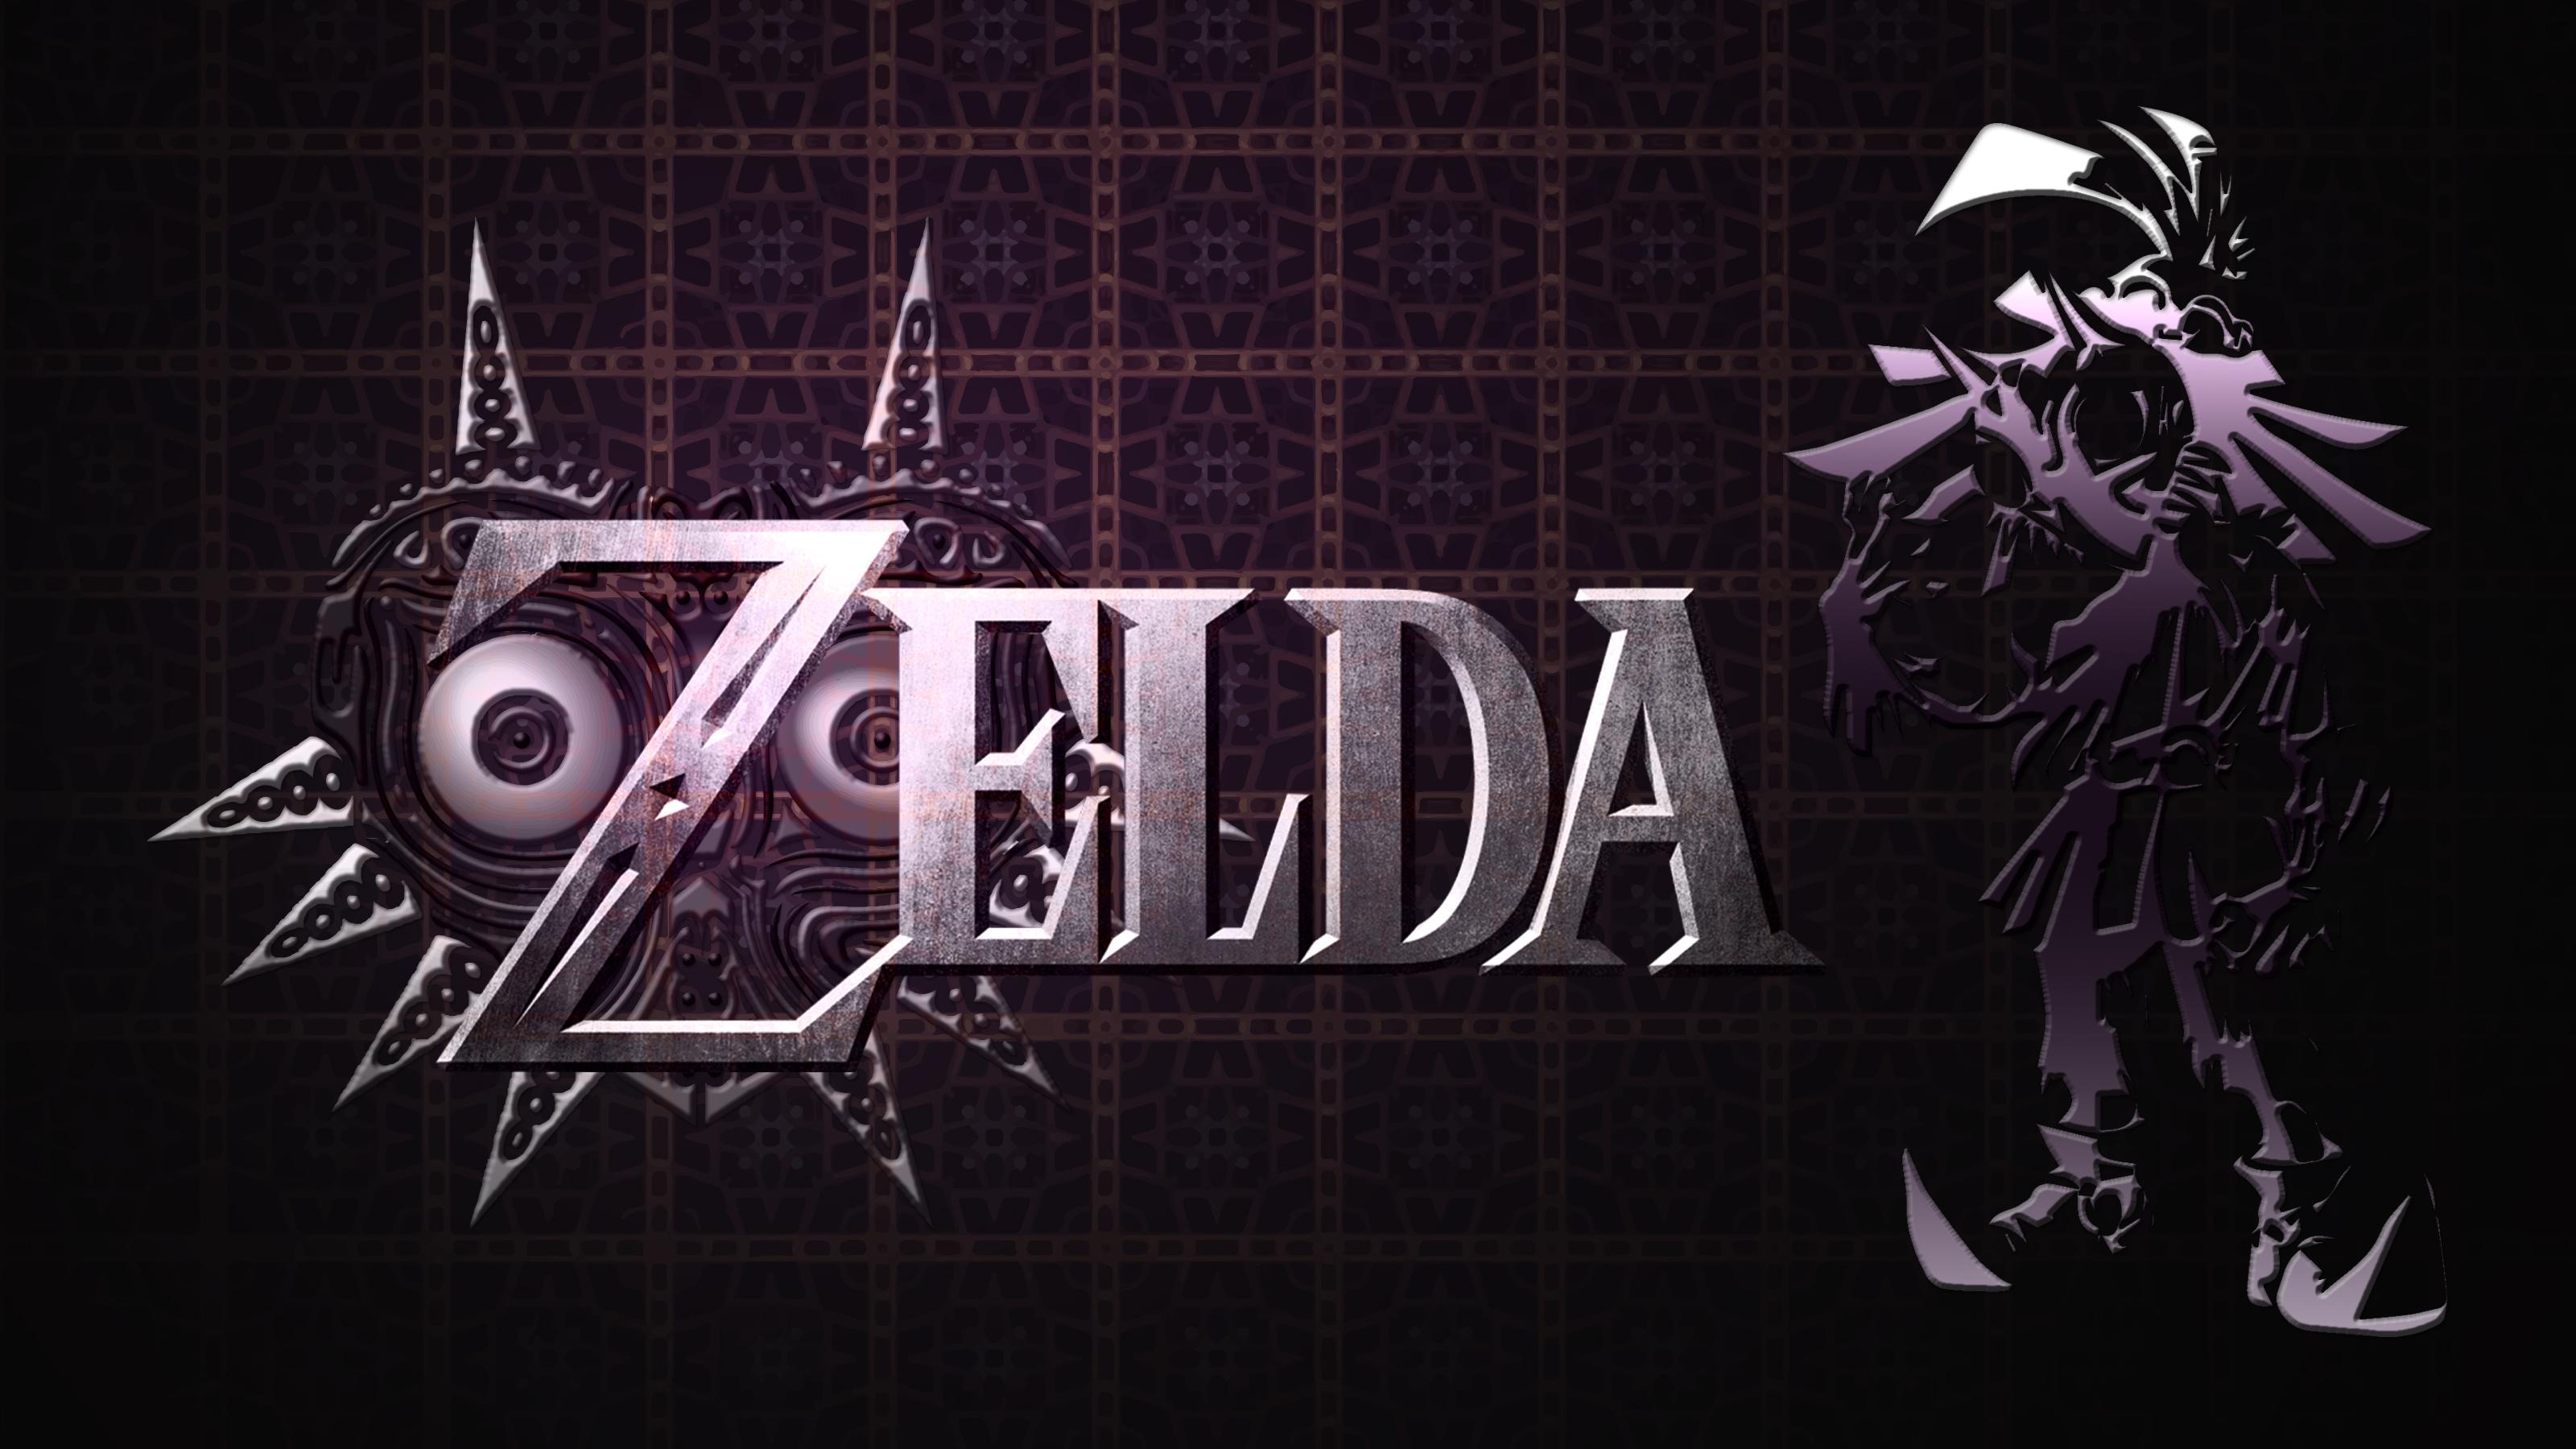 The Legend Of Zelda Majora S Mask 3ds Wallpaper By Stevenstone89